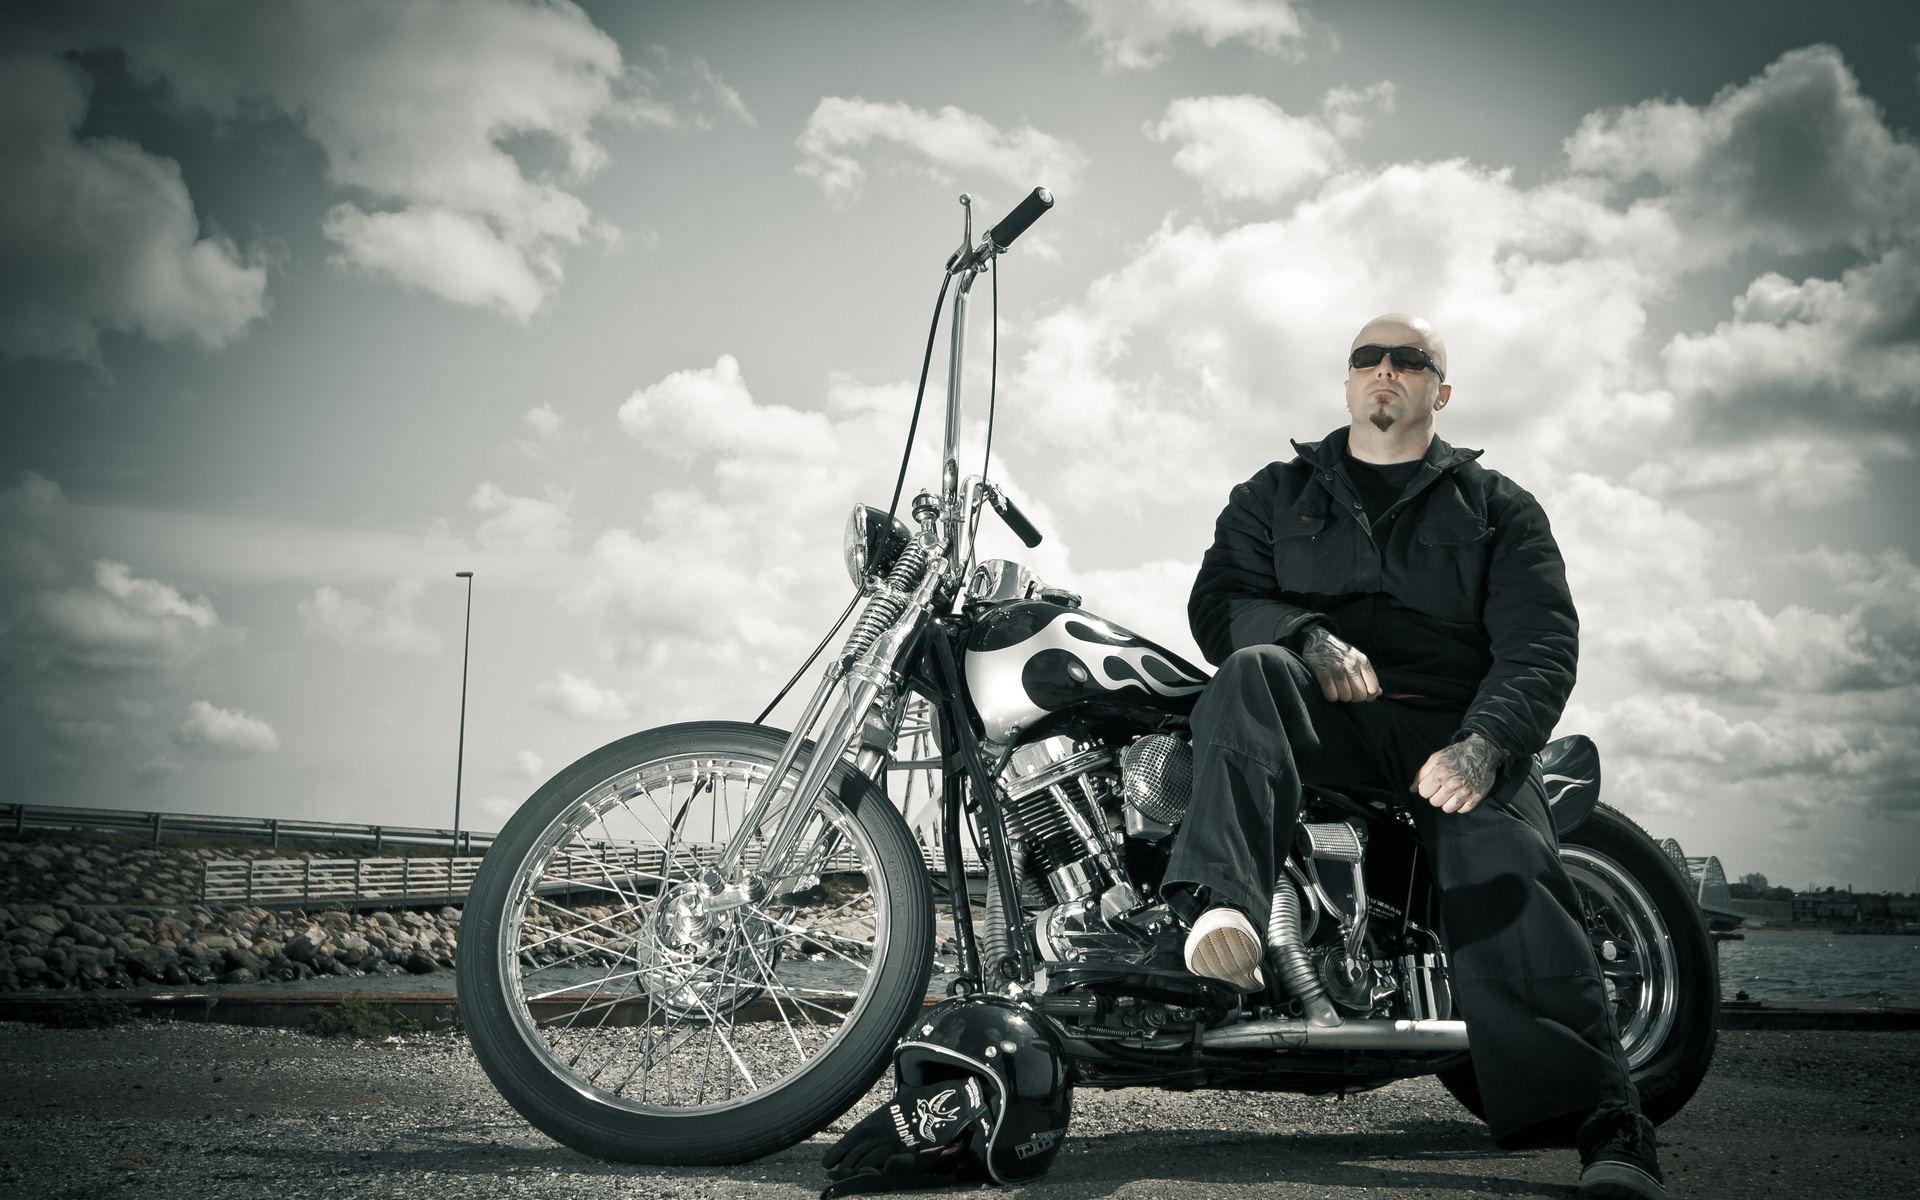 Harley Davidson Motorcycle HD Desktop Wallpaper